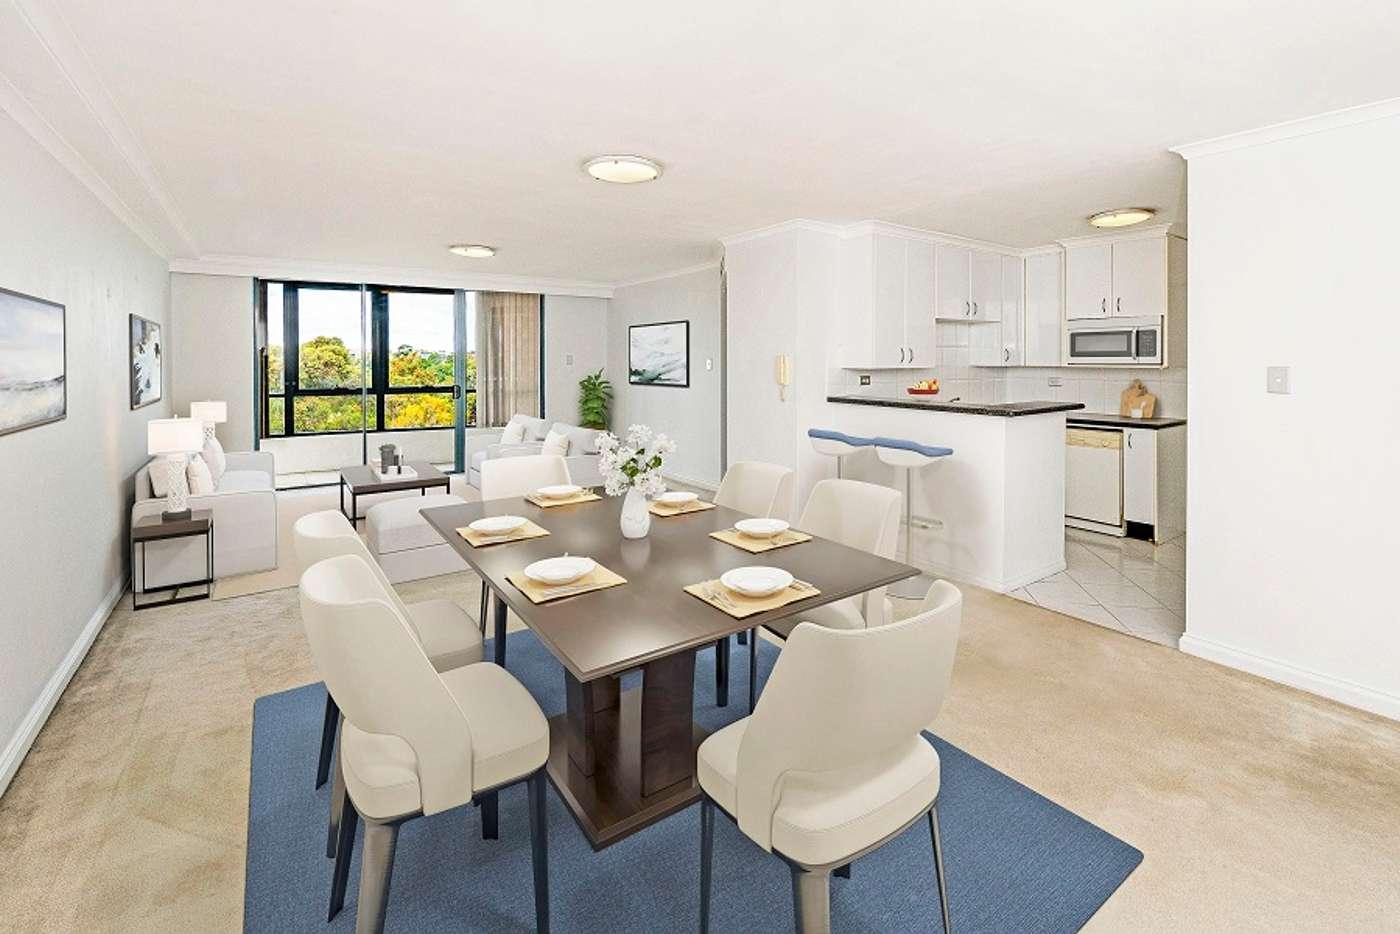 Main view of Homely apartment listing, 83-93 Dalmeny Avenue, Rosebery NSW 2018